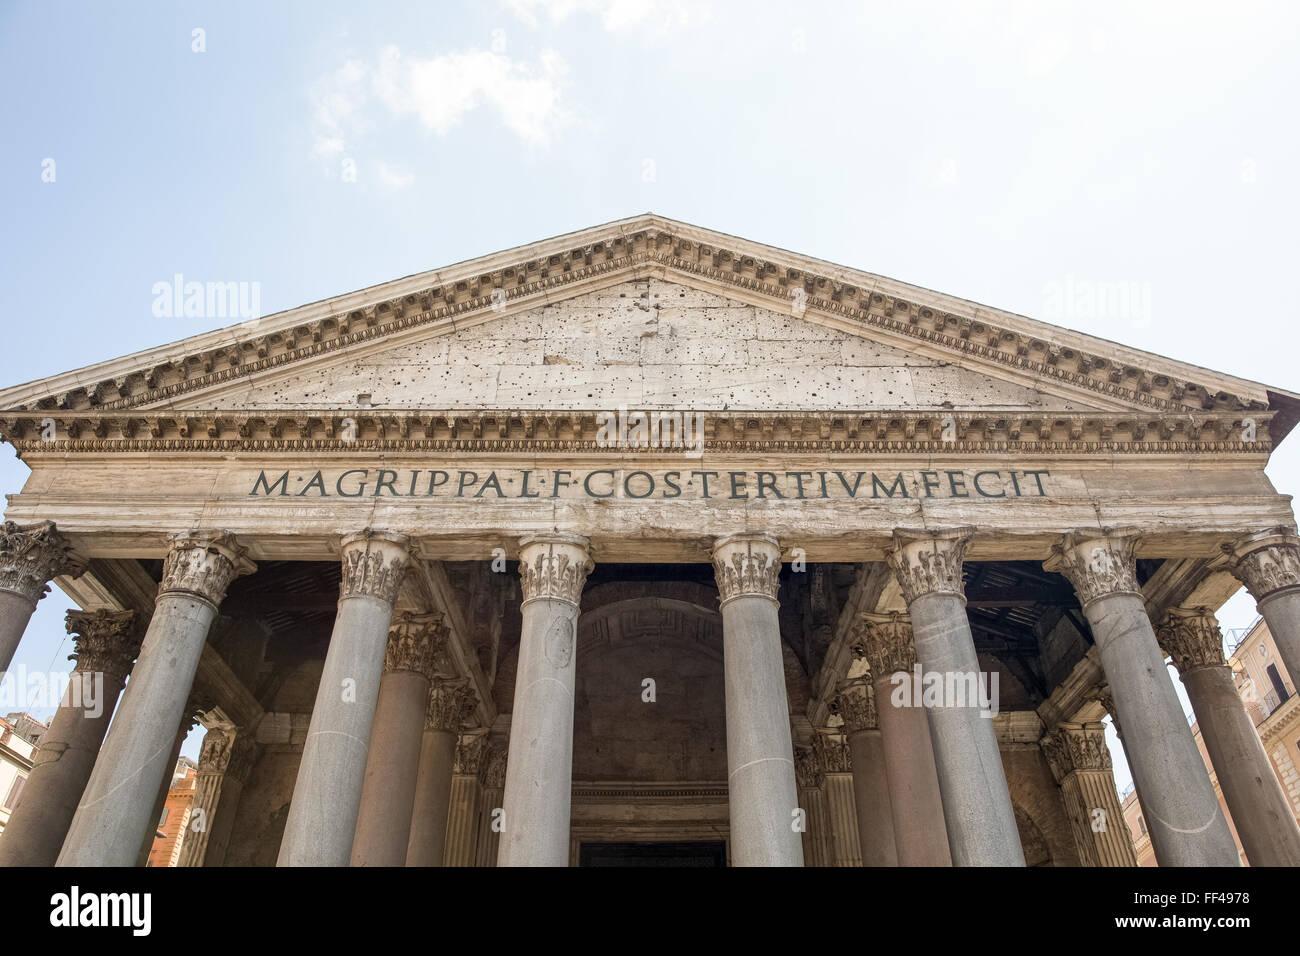 chaos dunk pantheon rome - photo#18